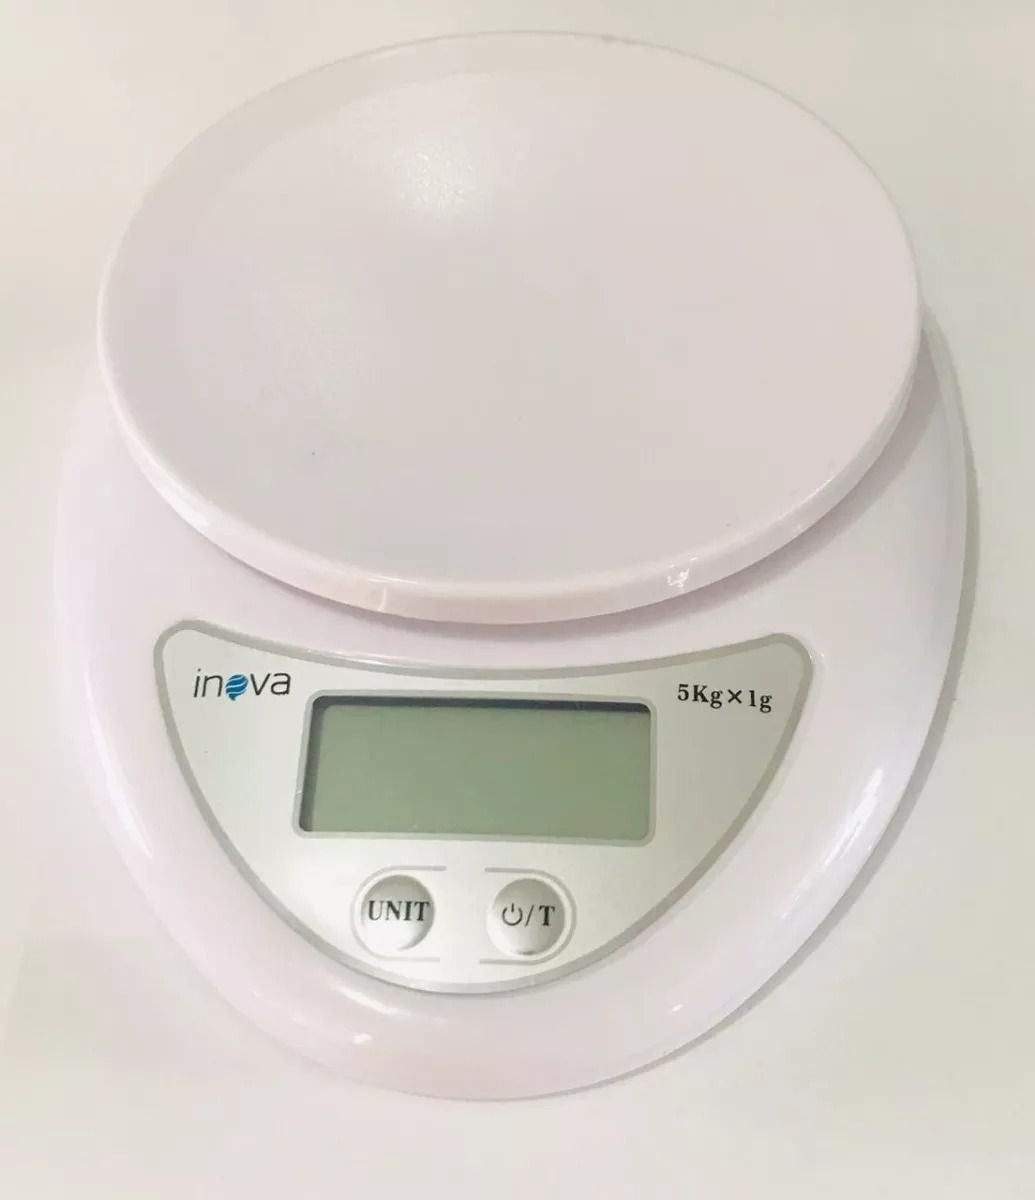 eanxMini Balança Digital Portátil até 5kg Inova